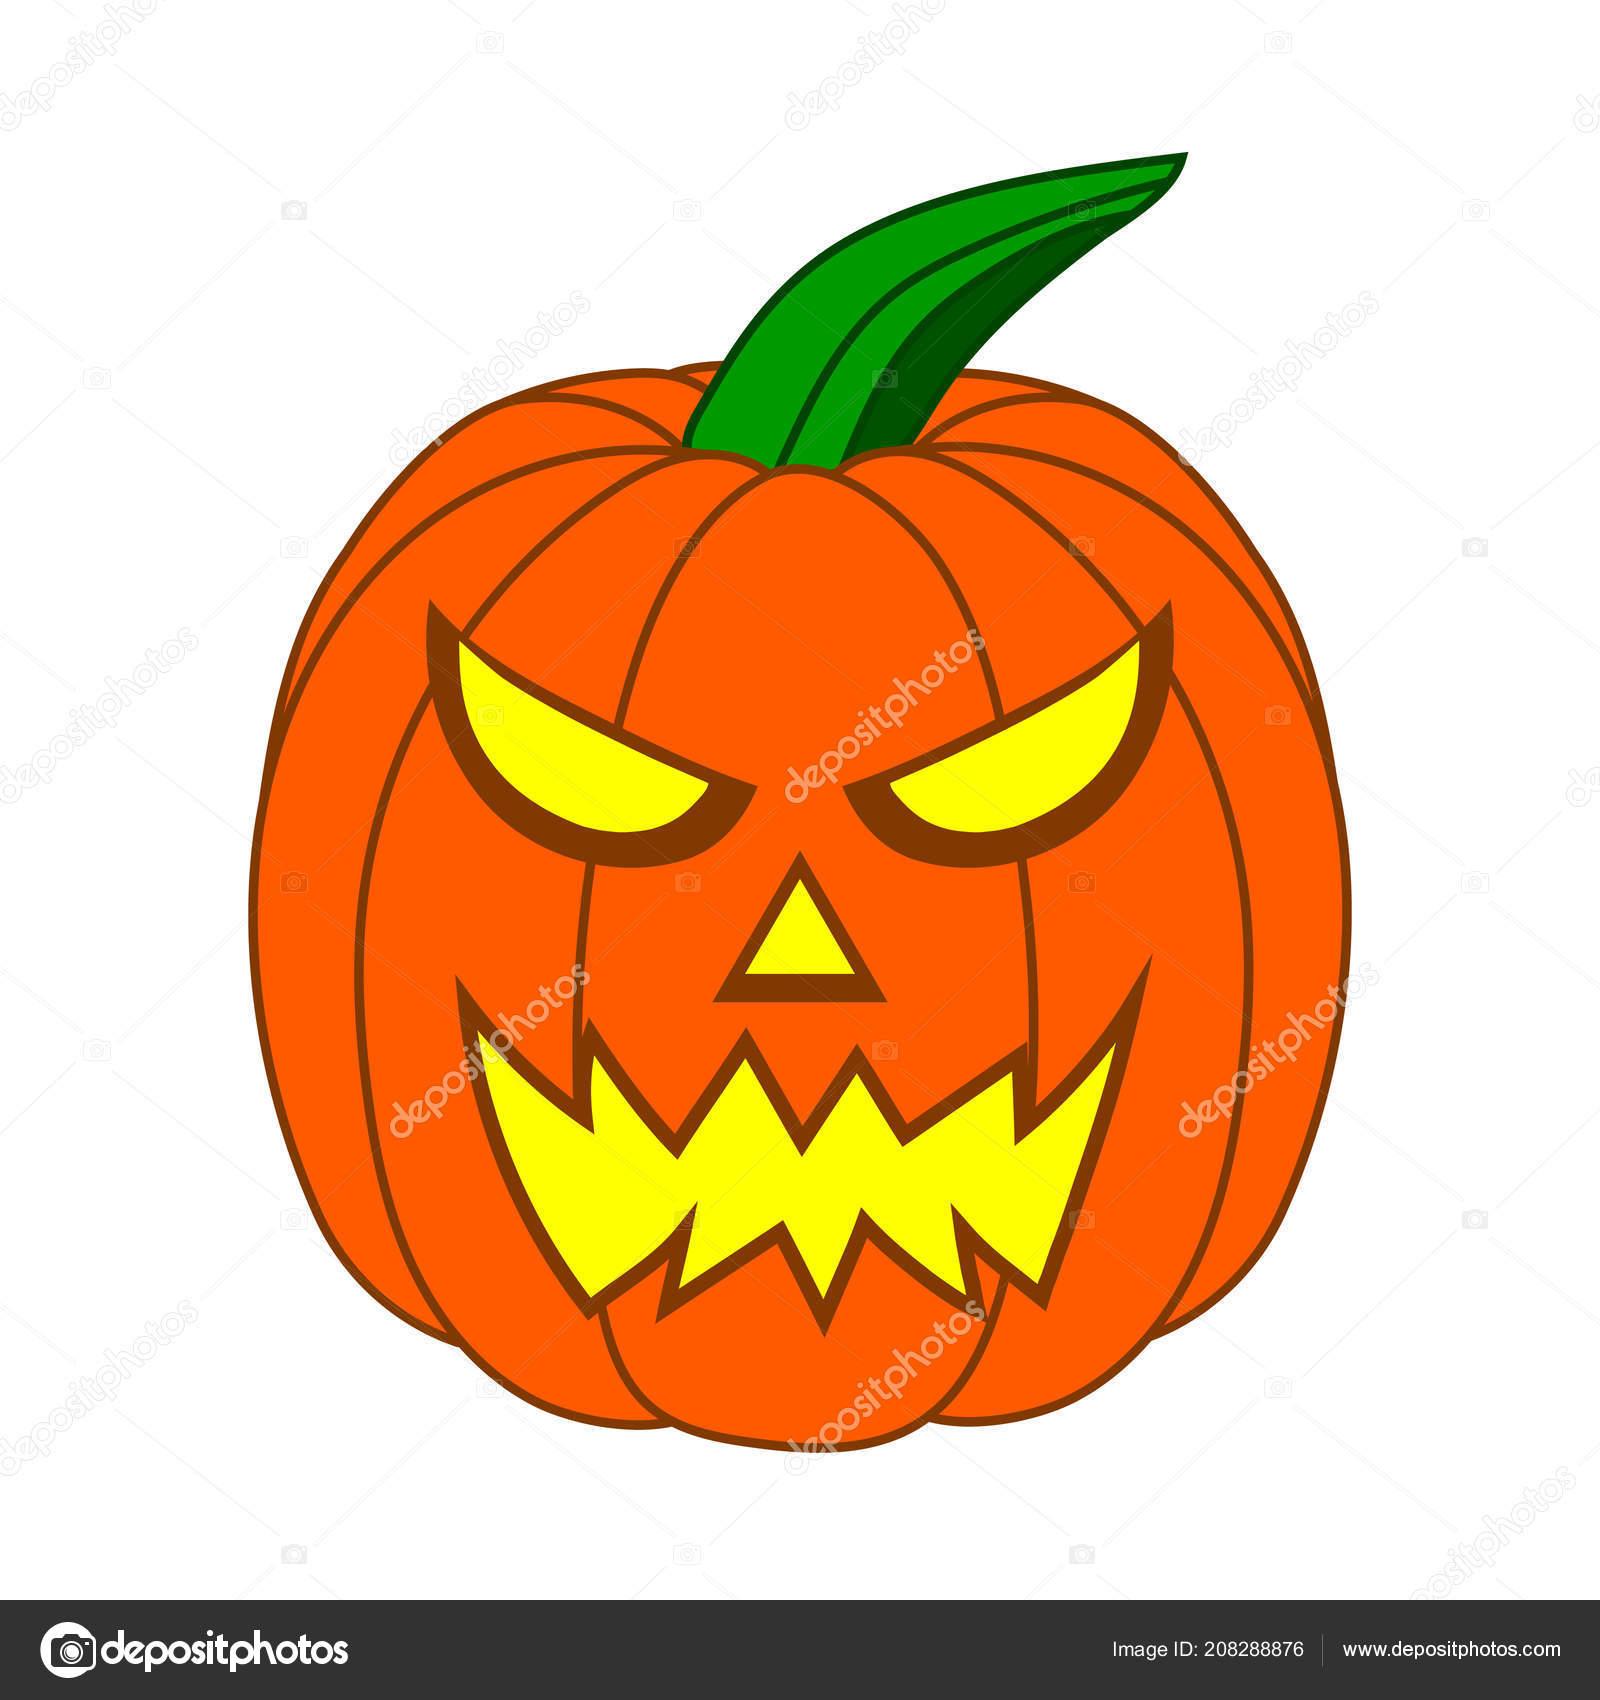 Halloween Pumpkin Cartoon Images.Scary Cartoon Halloween Pumpkin Funny Face Isolated White